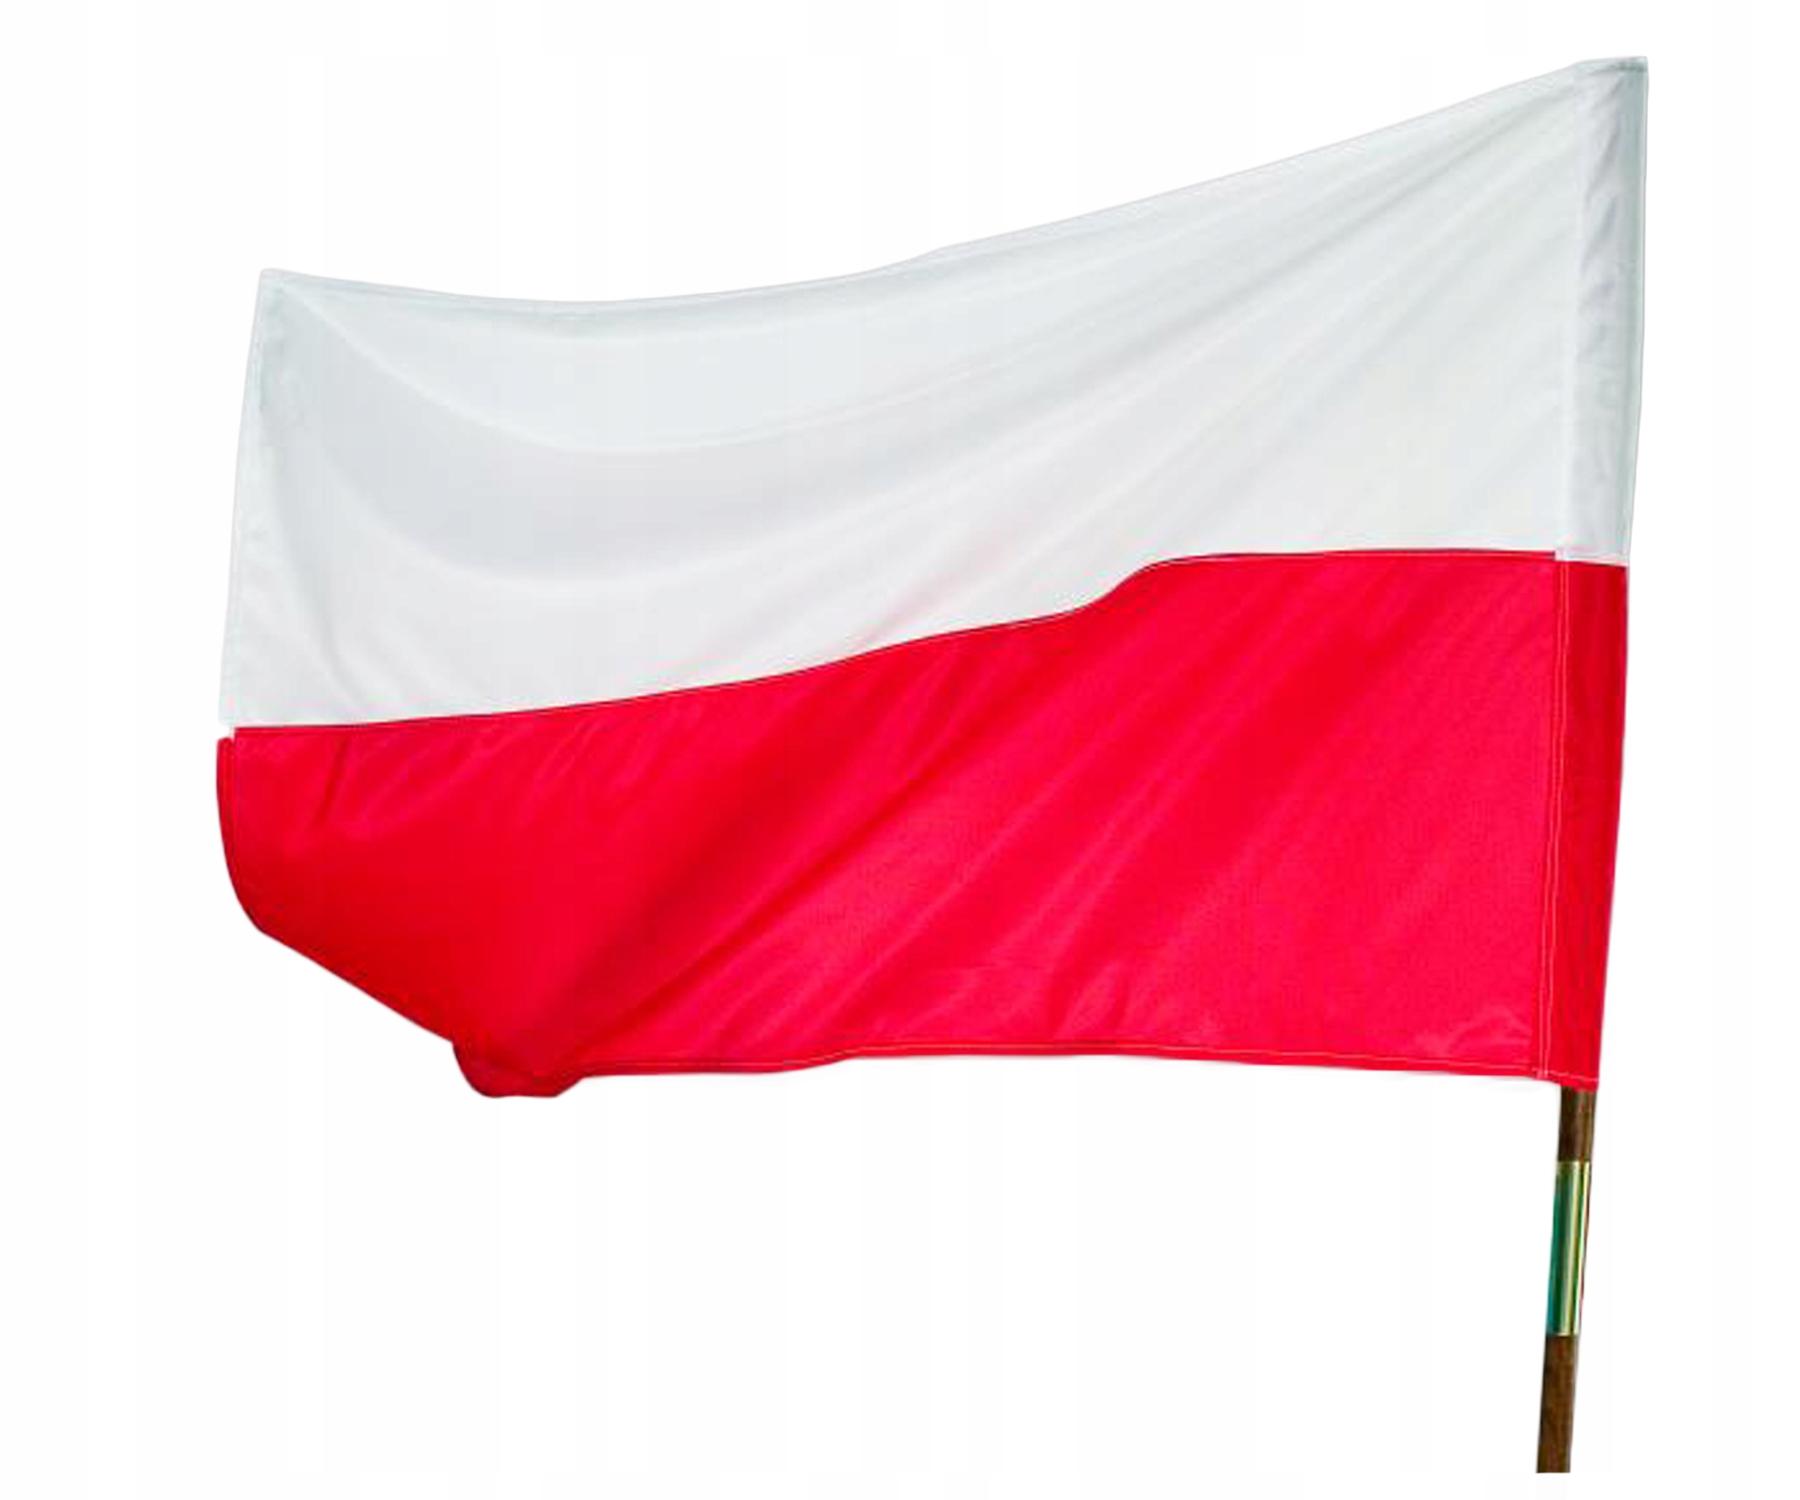 FLAGA FLAGI POLSKA POLSKI NARODOWA 112x70cm TEXICO